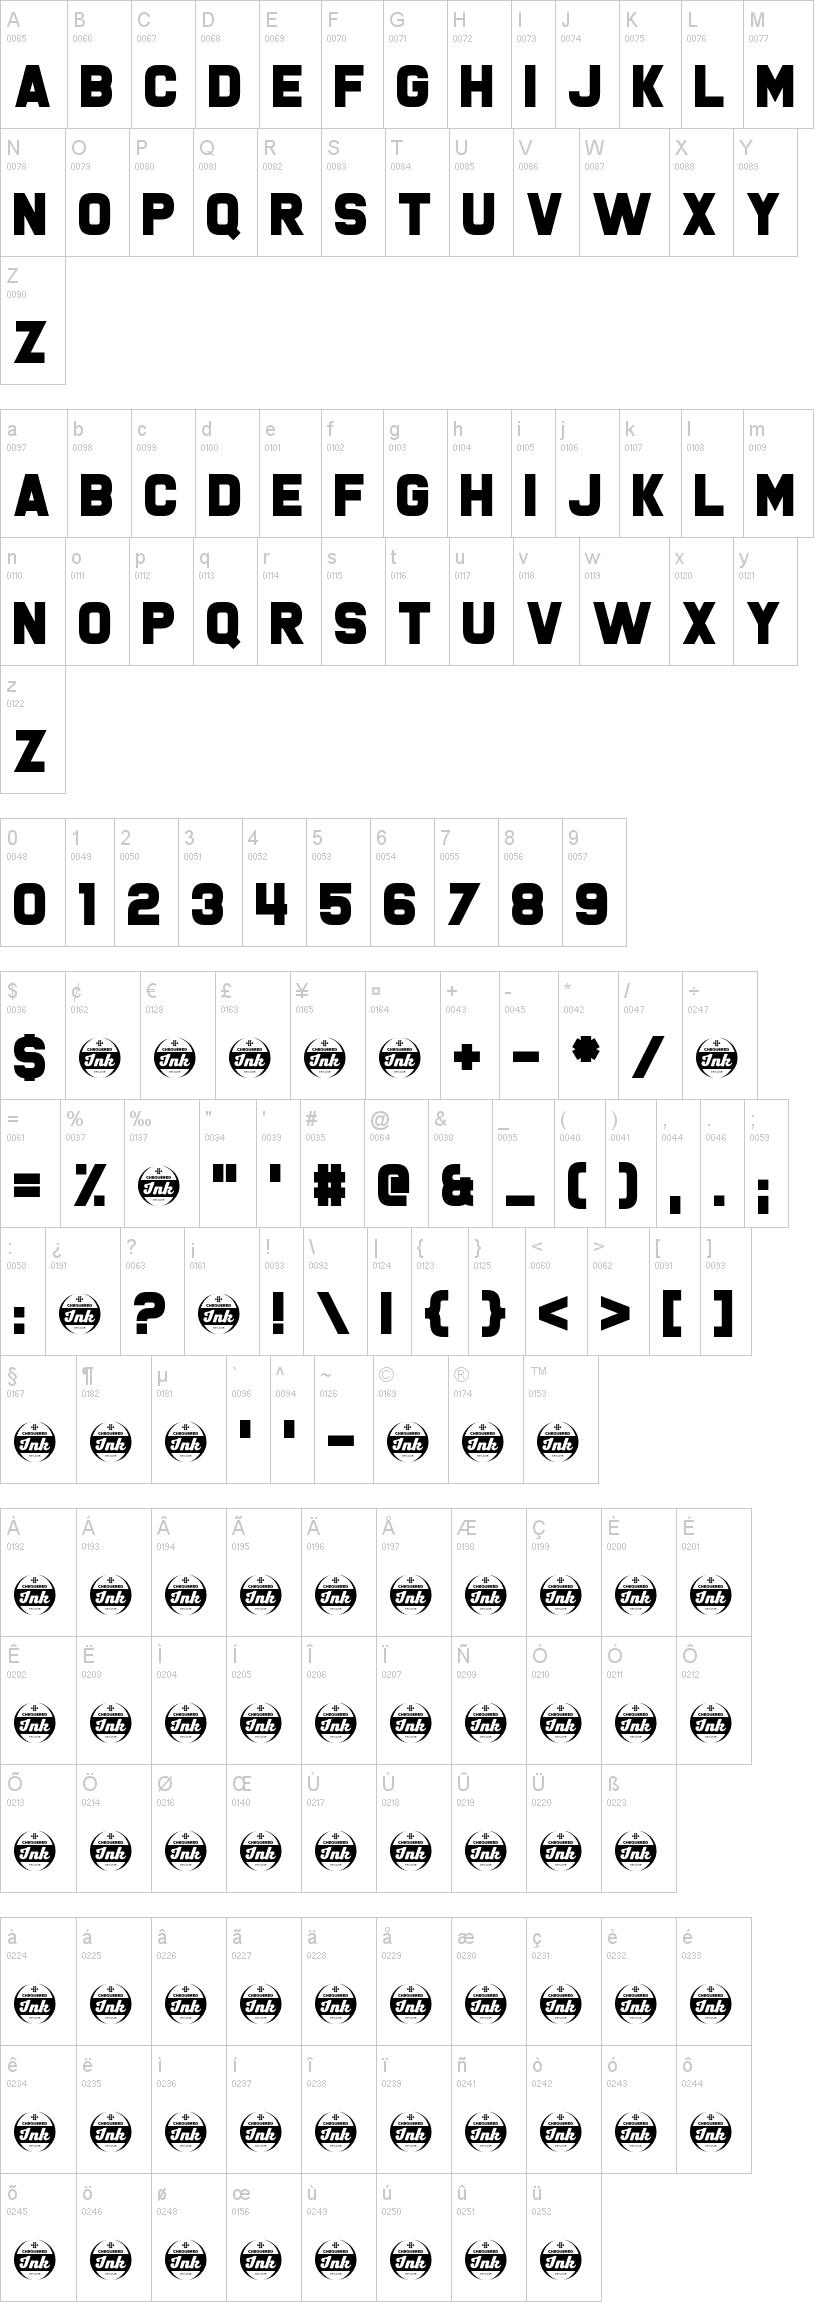 Boomer Tantrum Font-1